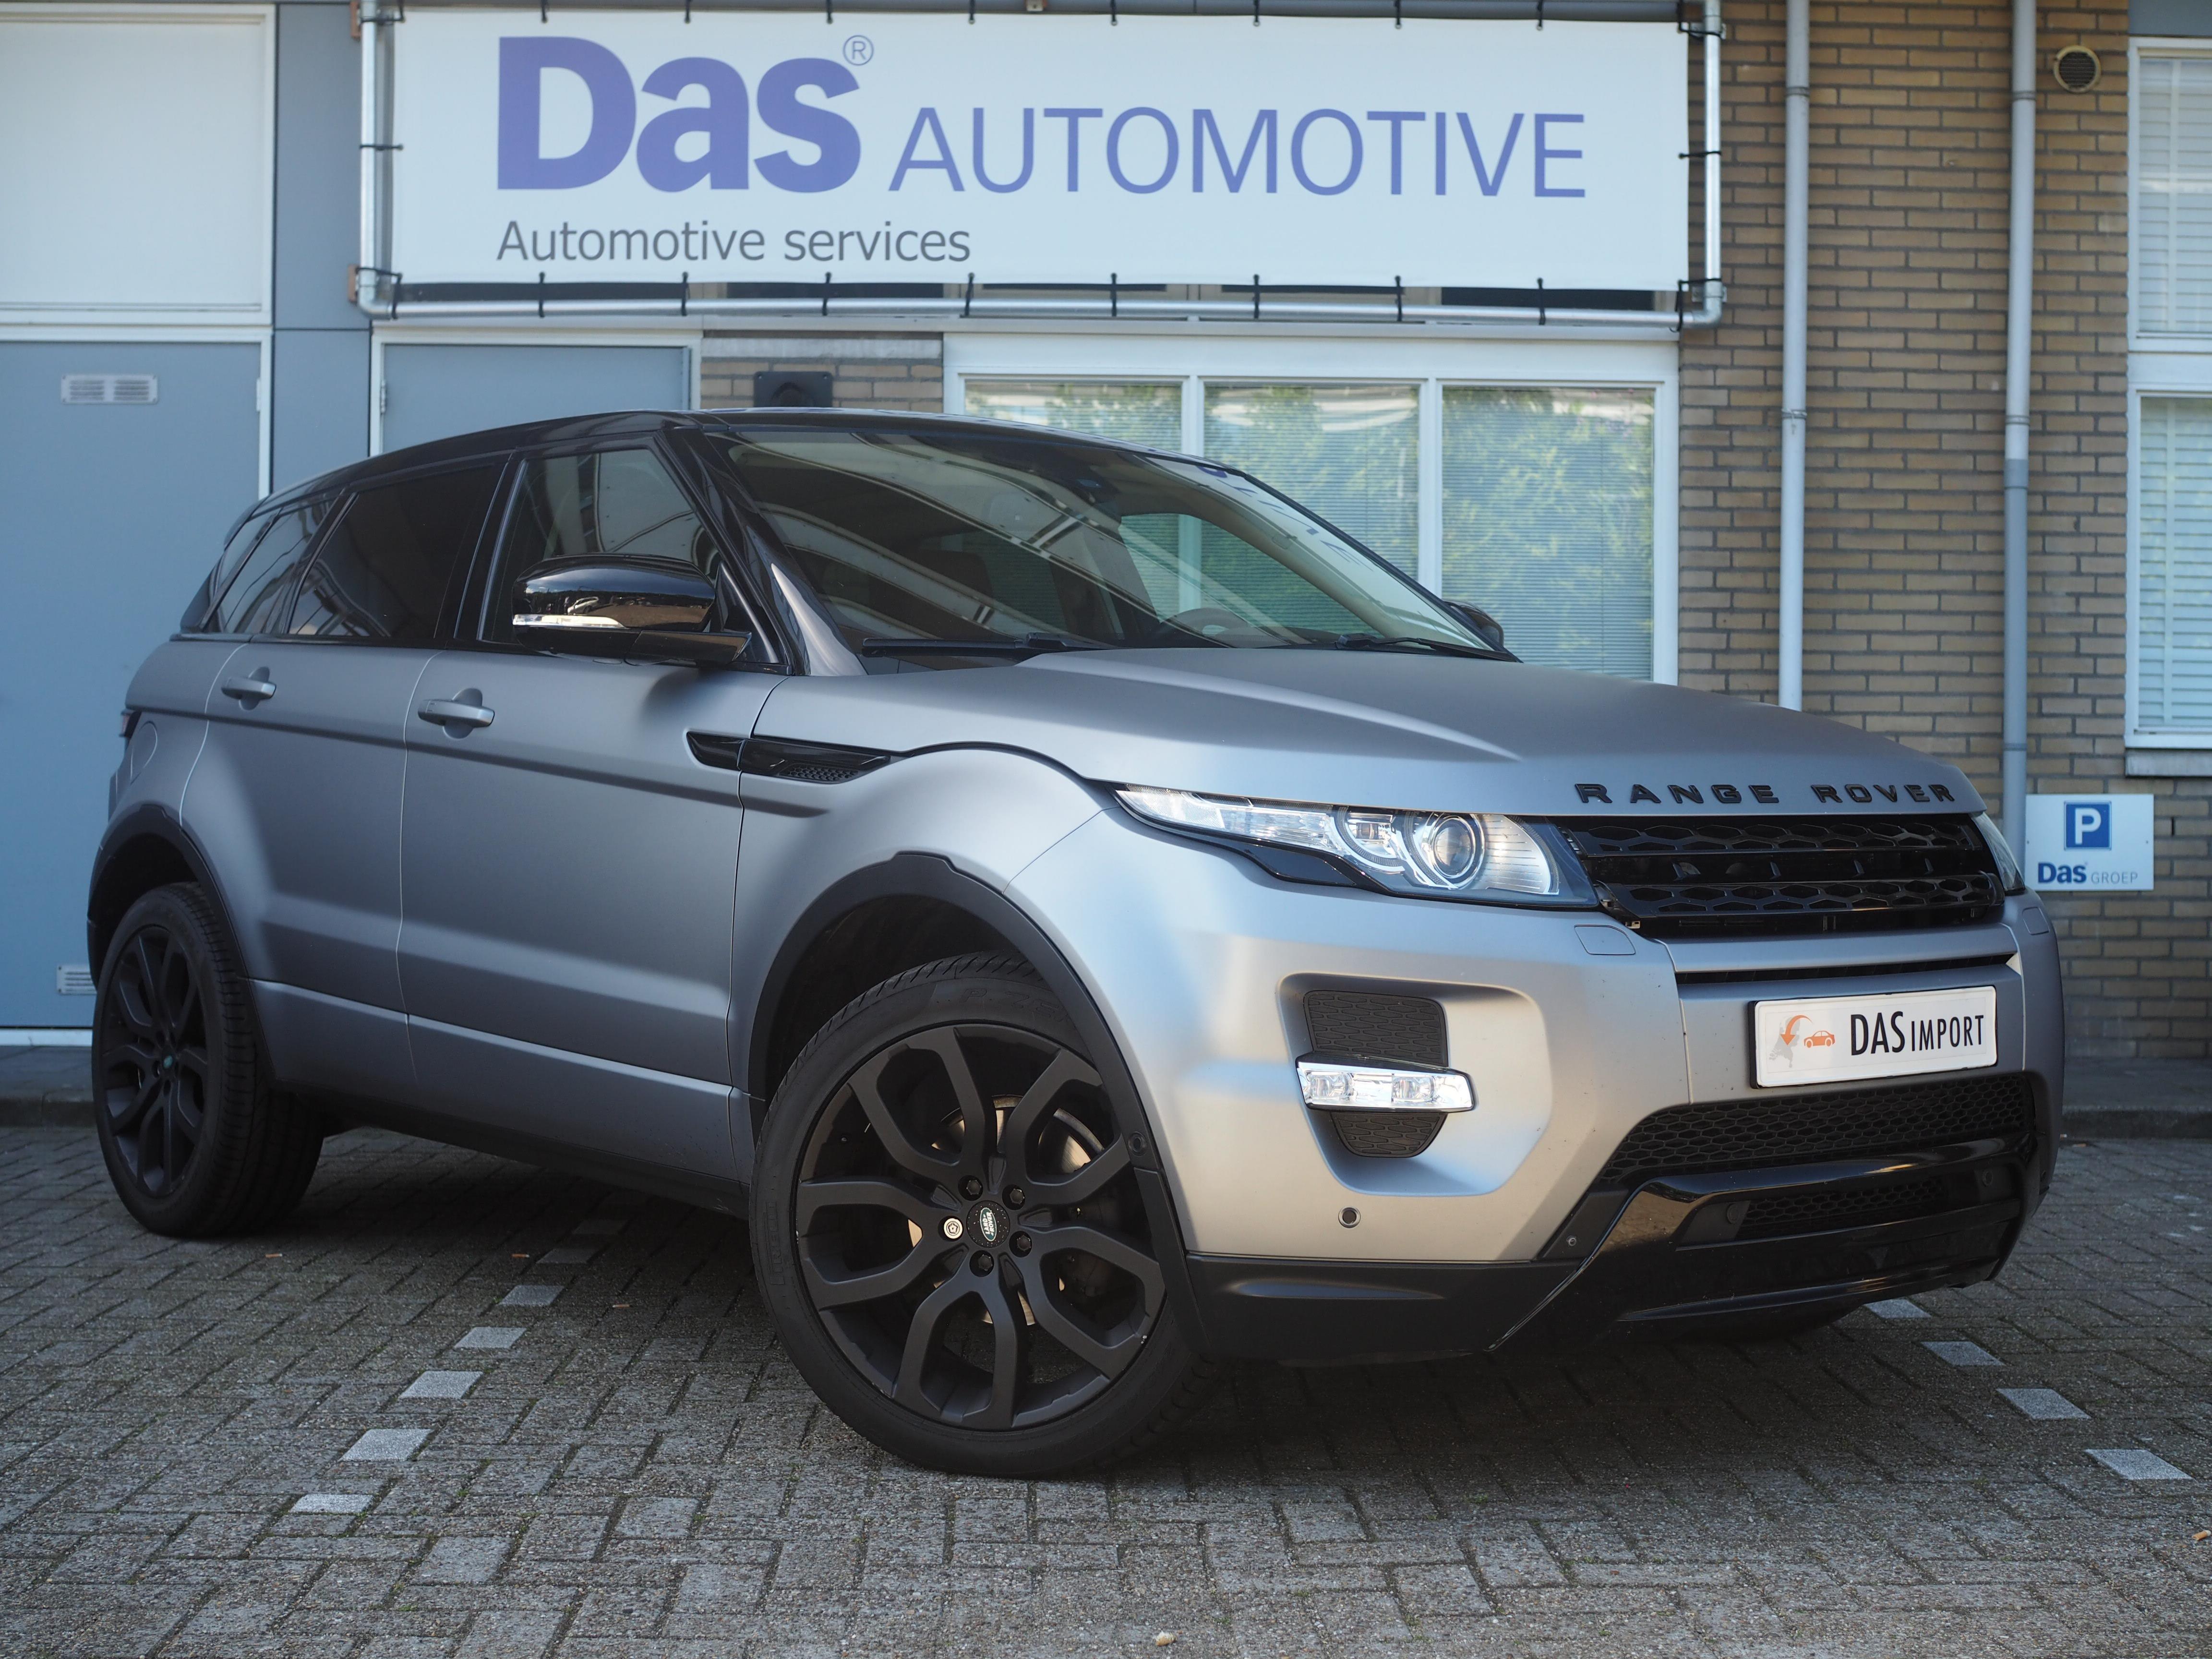 Importauto: Land Rover Range Rover Evoque Diesel 2.2 SD4 4WD Dynamic Aut. 9/2011